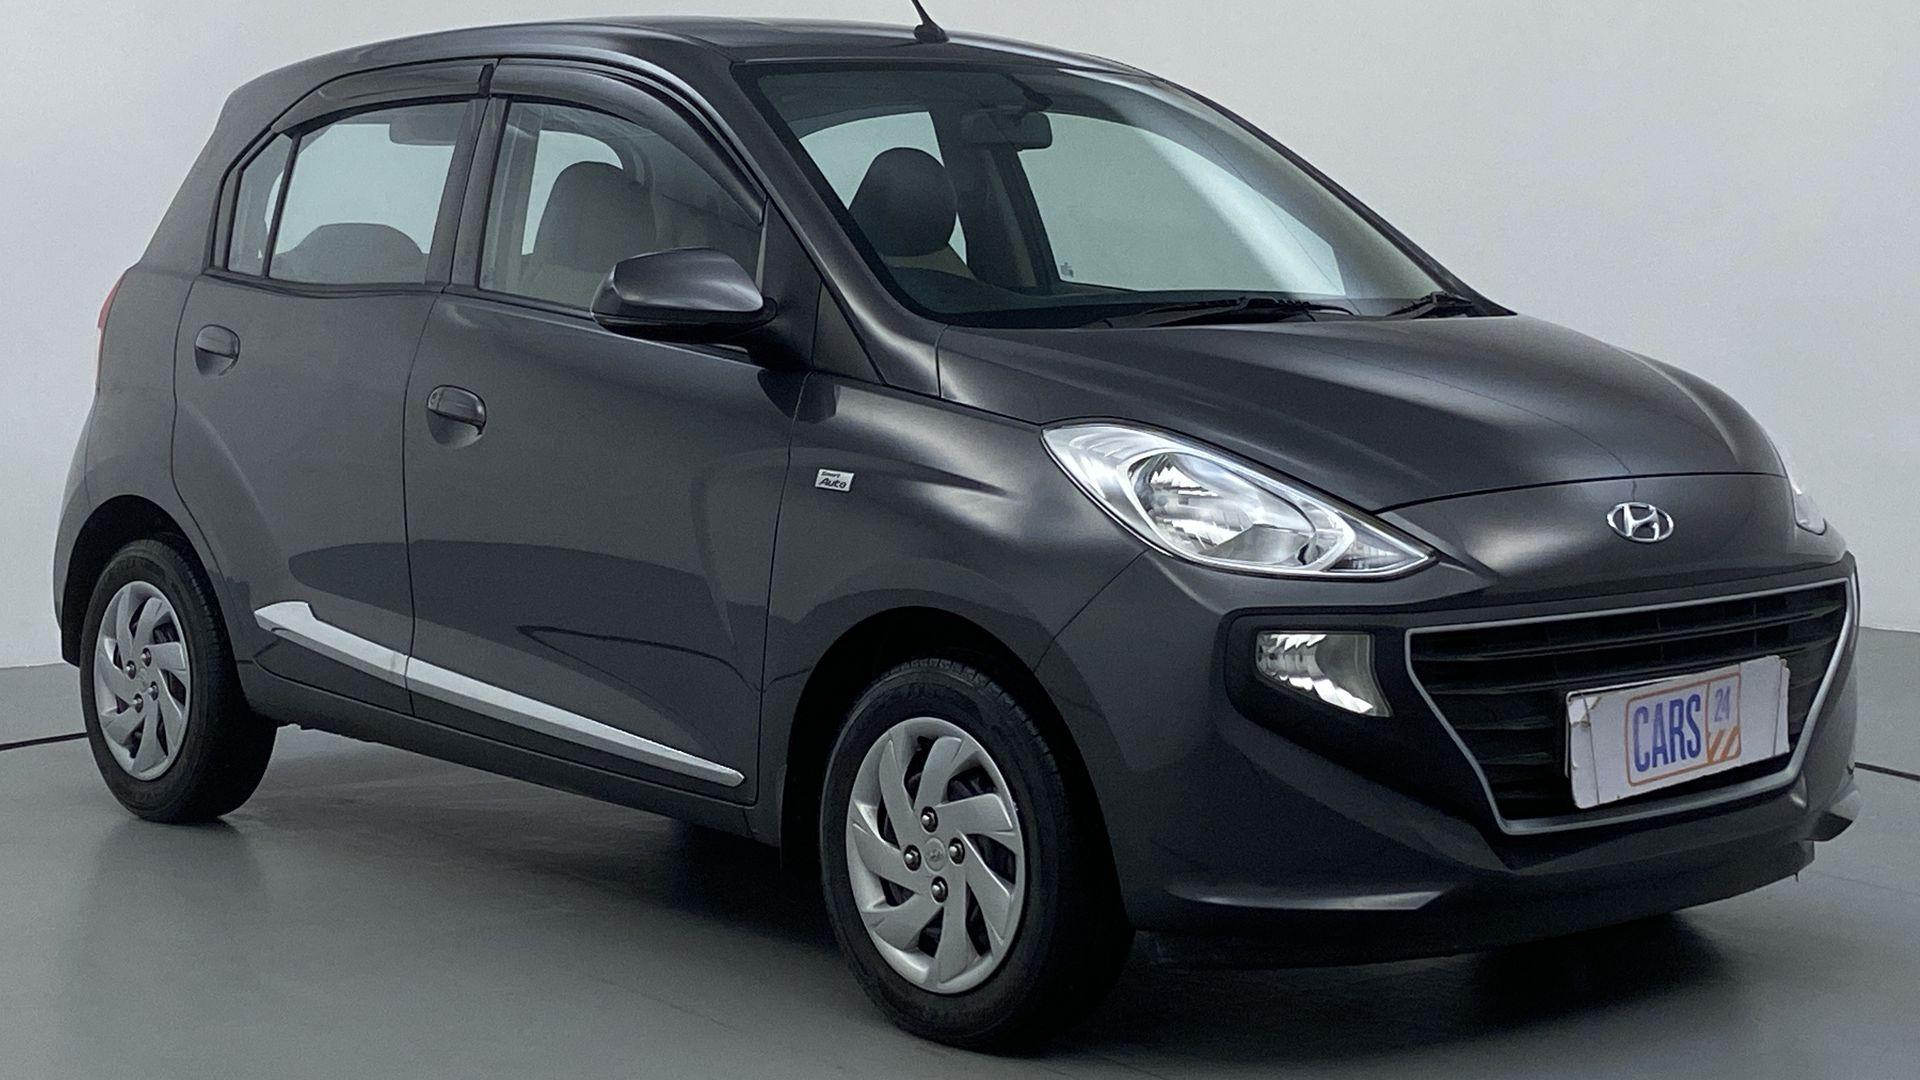 2020 Hyundai NEW SANTRO 1.1 SPORTS AMT